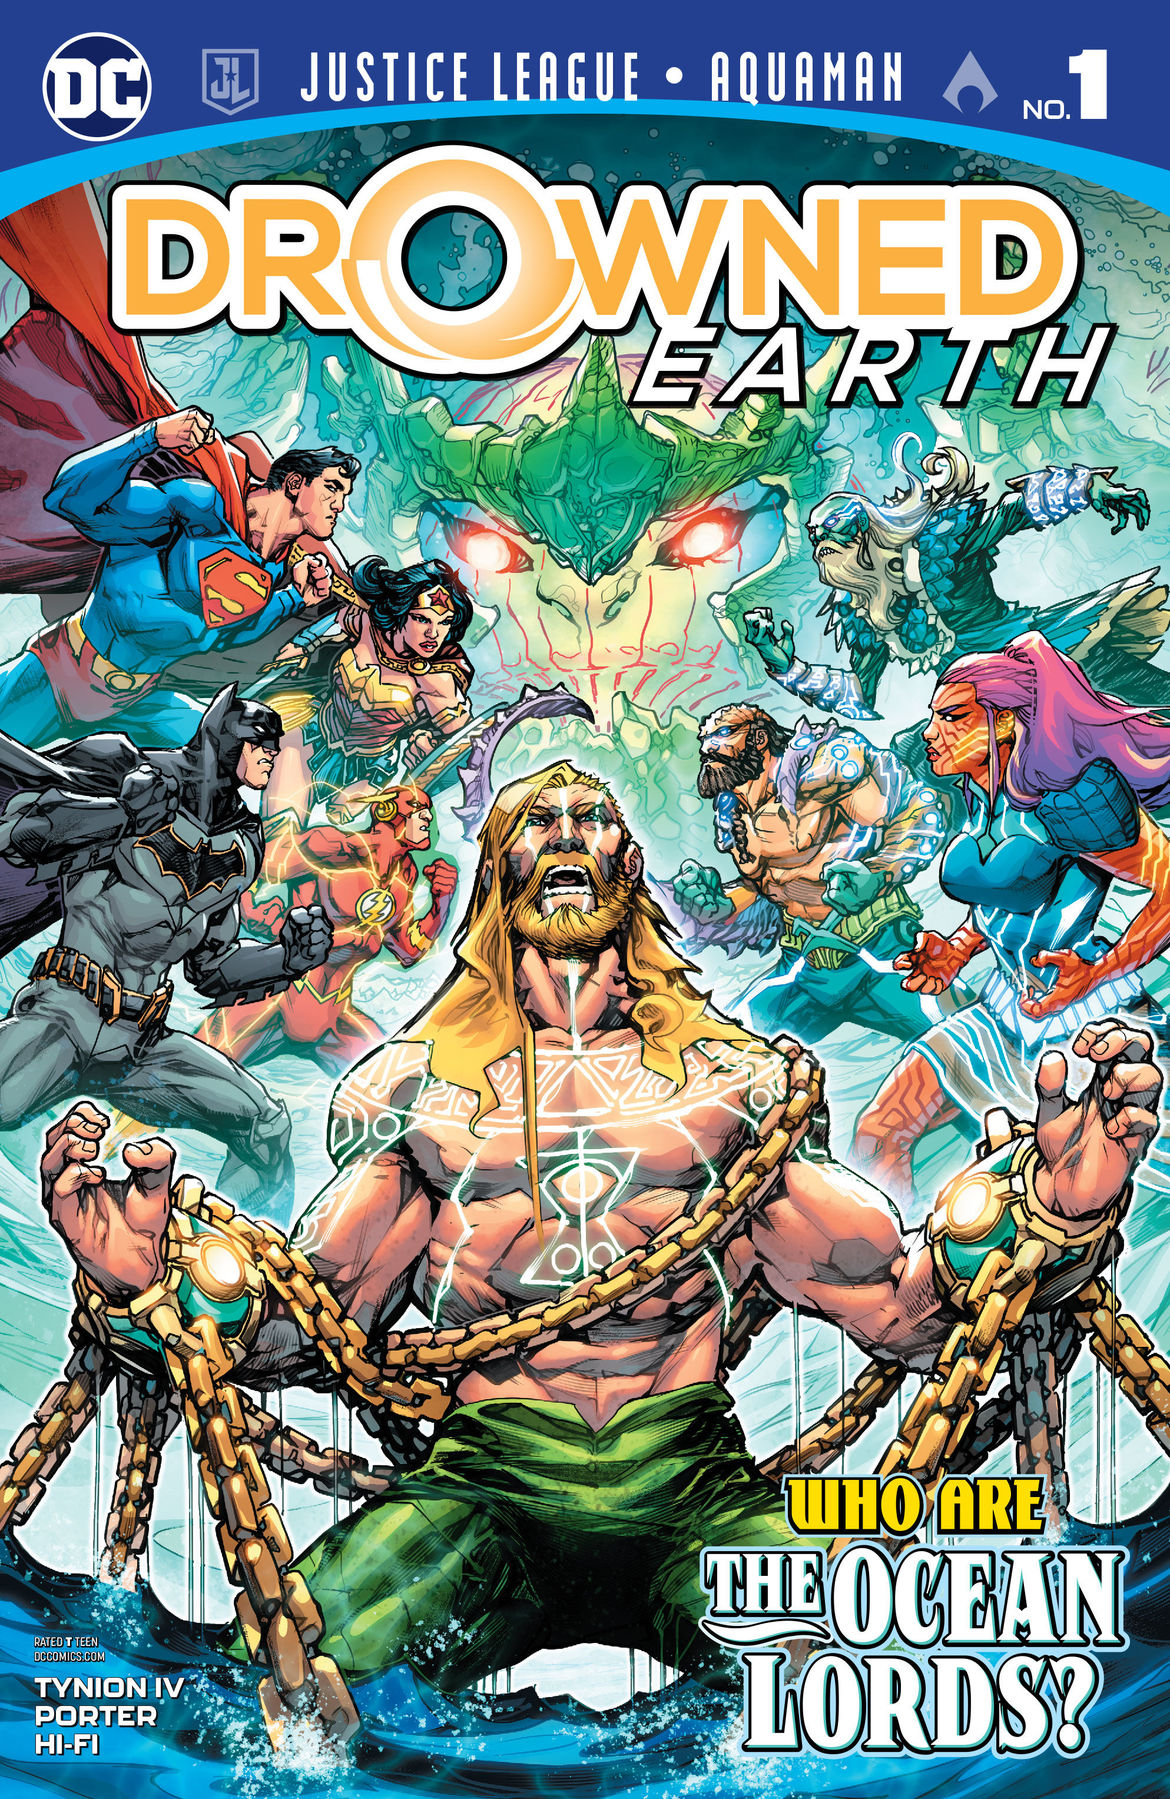 Justice League Aquaman Drowned Earth #1